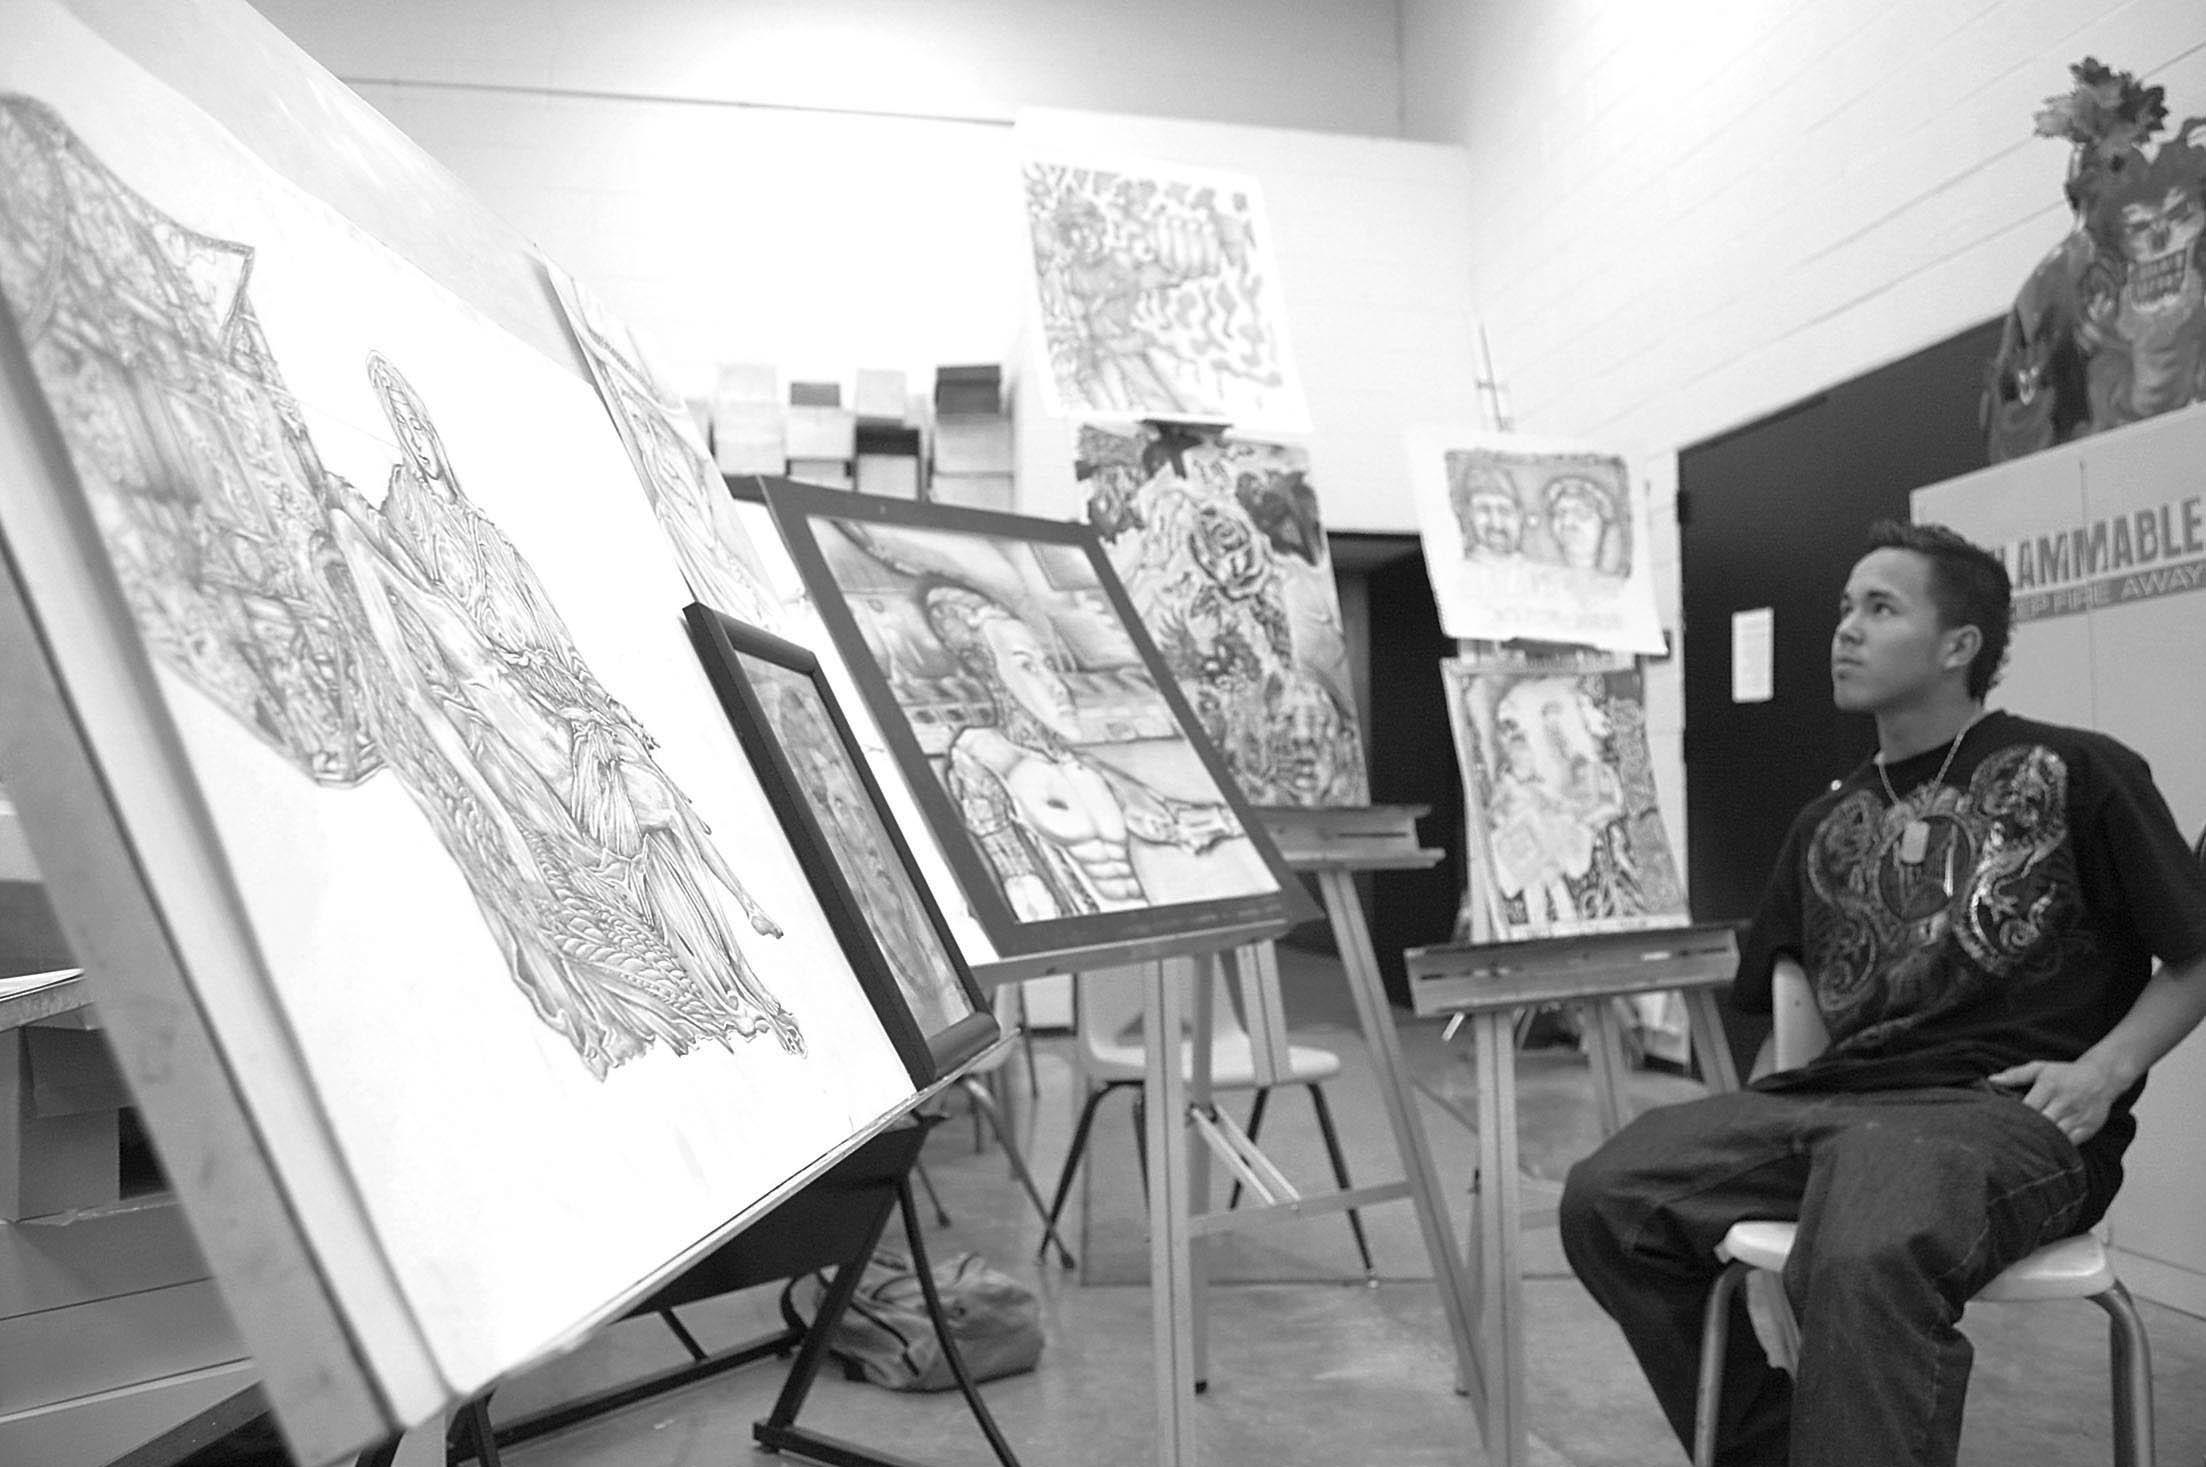 Seward student considers tattoo artistry as career